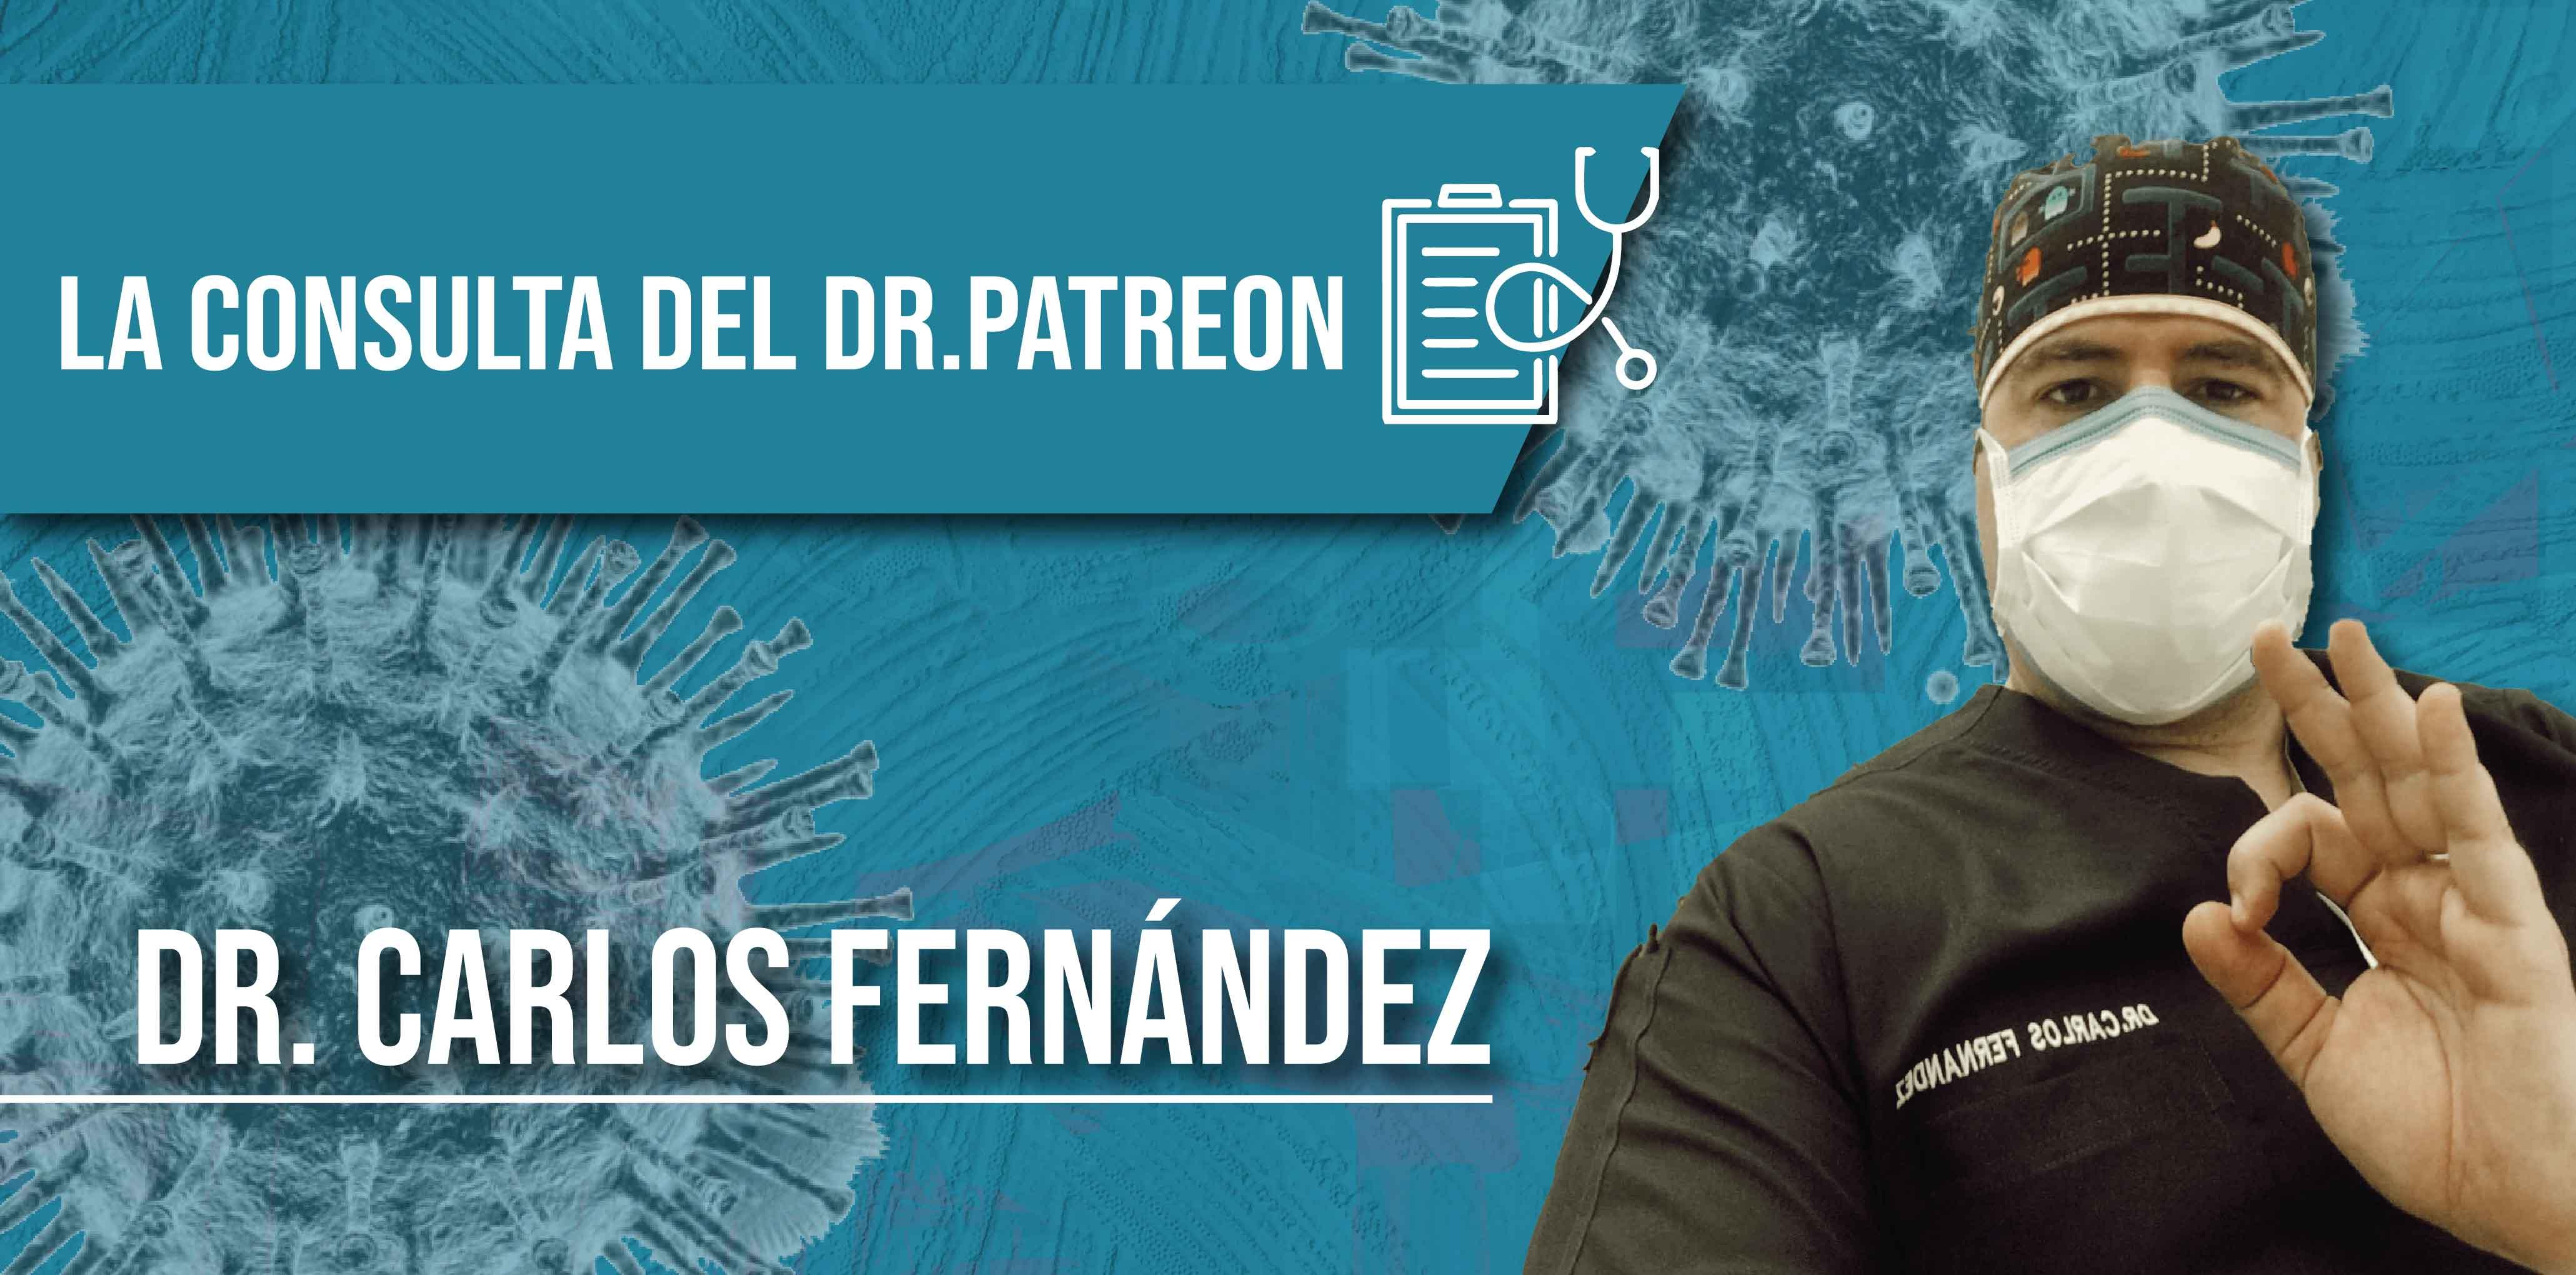 La Consulta del Dr. Patreon